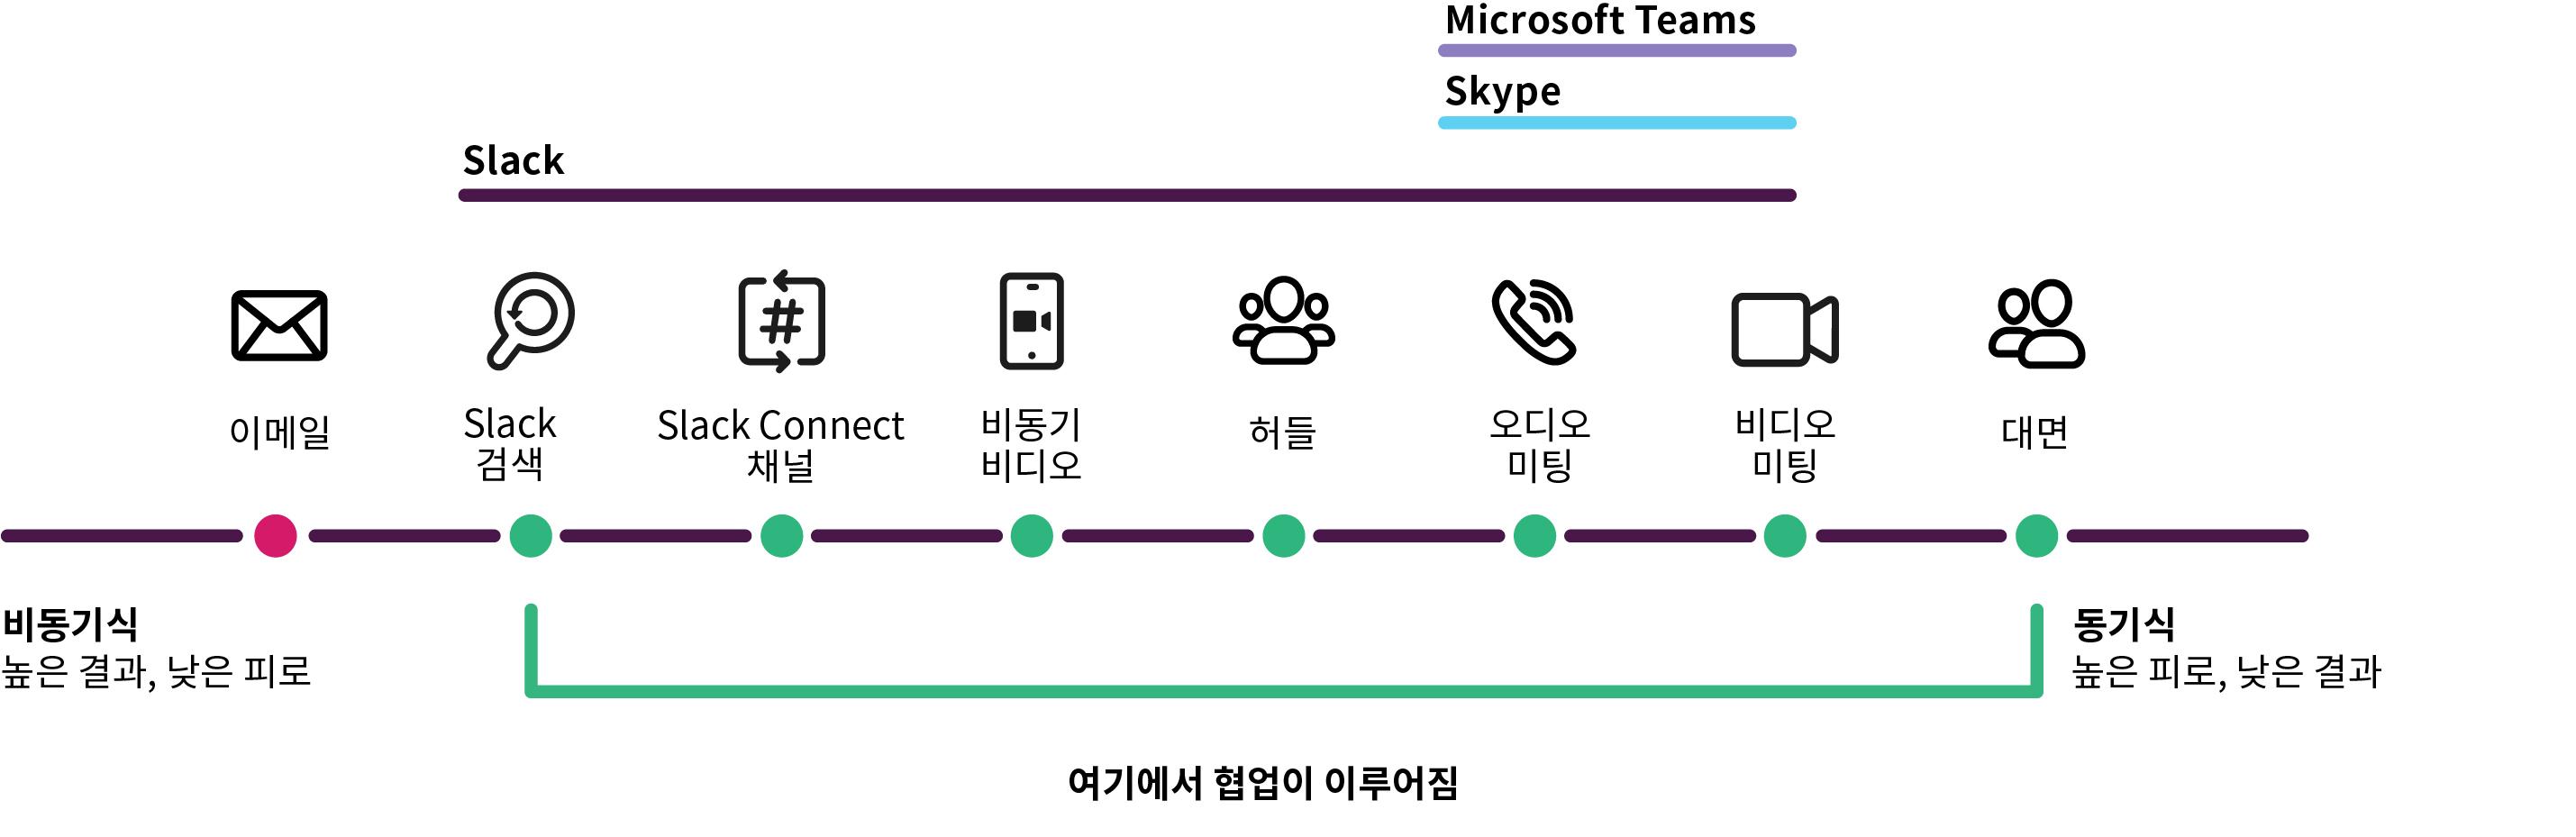 Slack과 Microsoft teams, Skype 및 Slack을 비교하는 차트